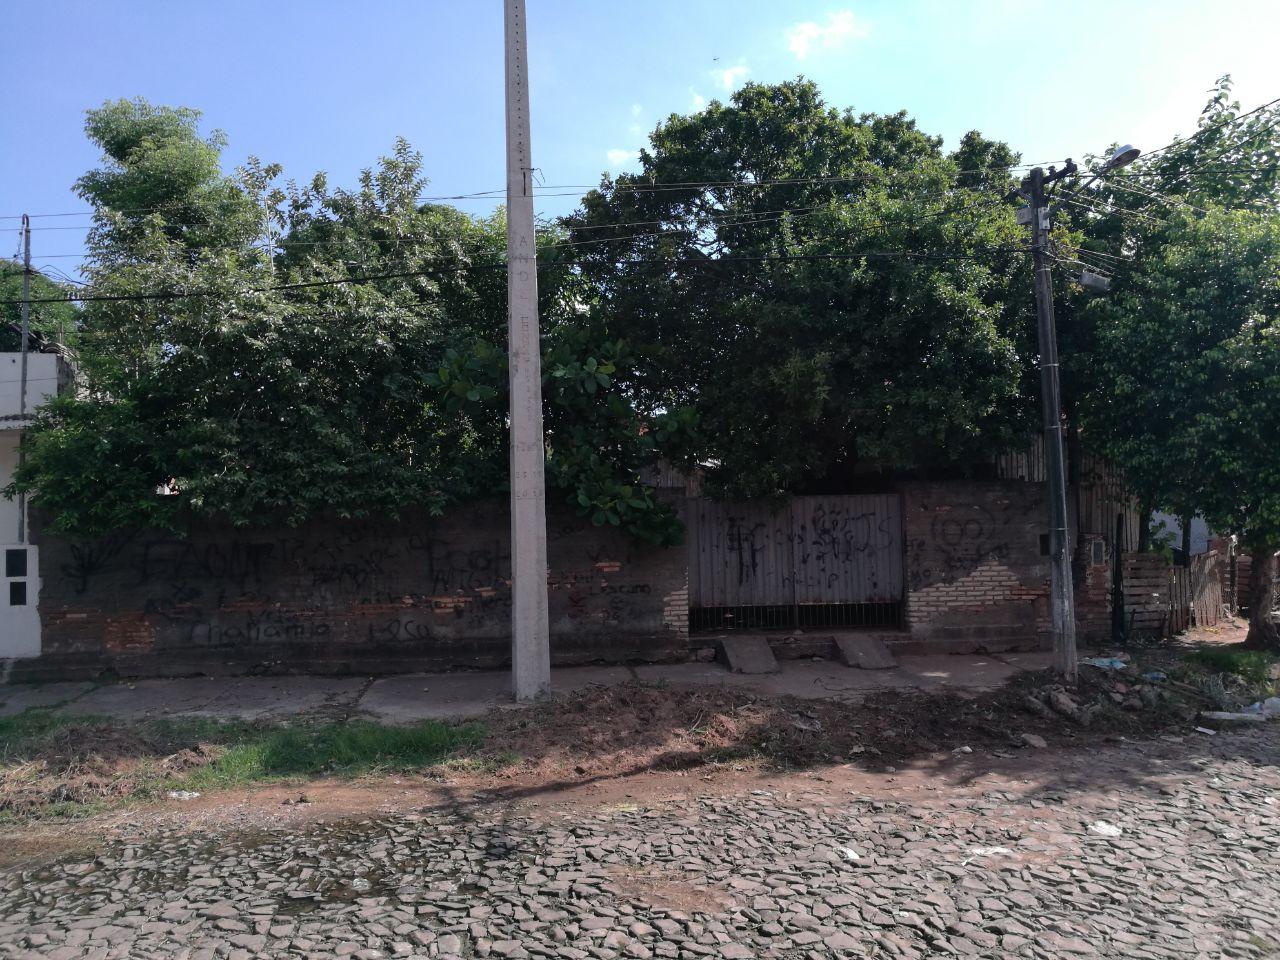 Vendo Terreno De 13x30 M2 En Lambare A 1 Cuadra De Cacique Zona Burguer King